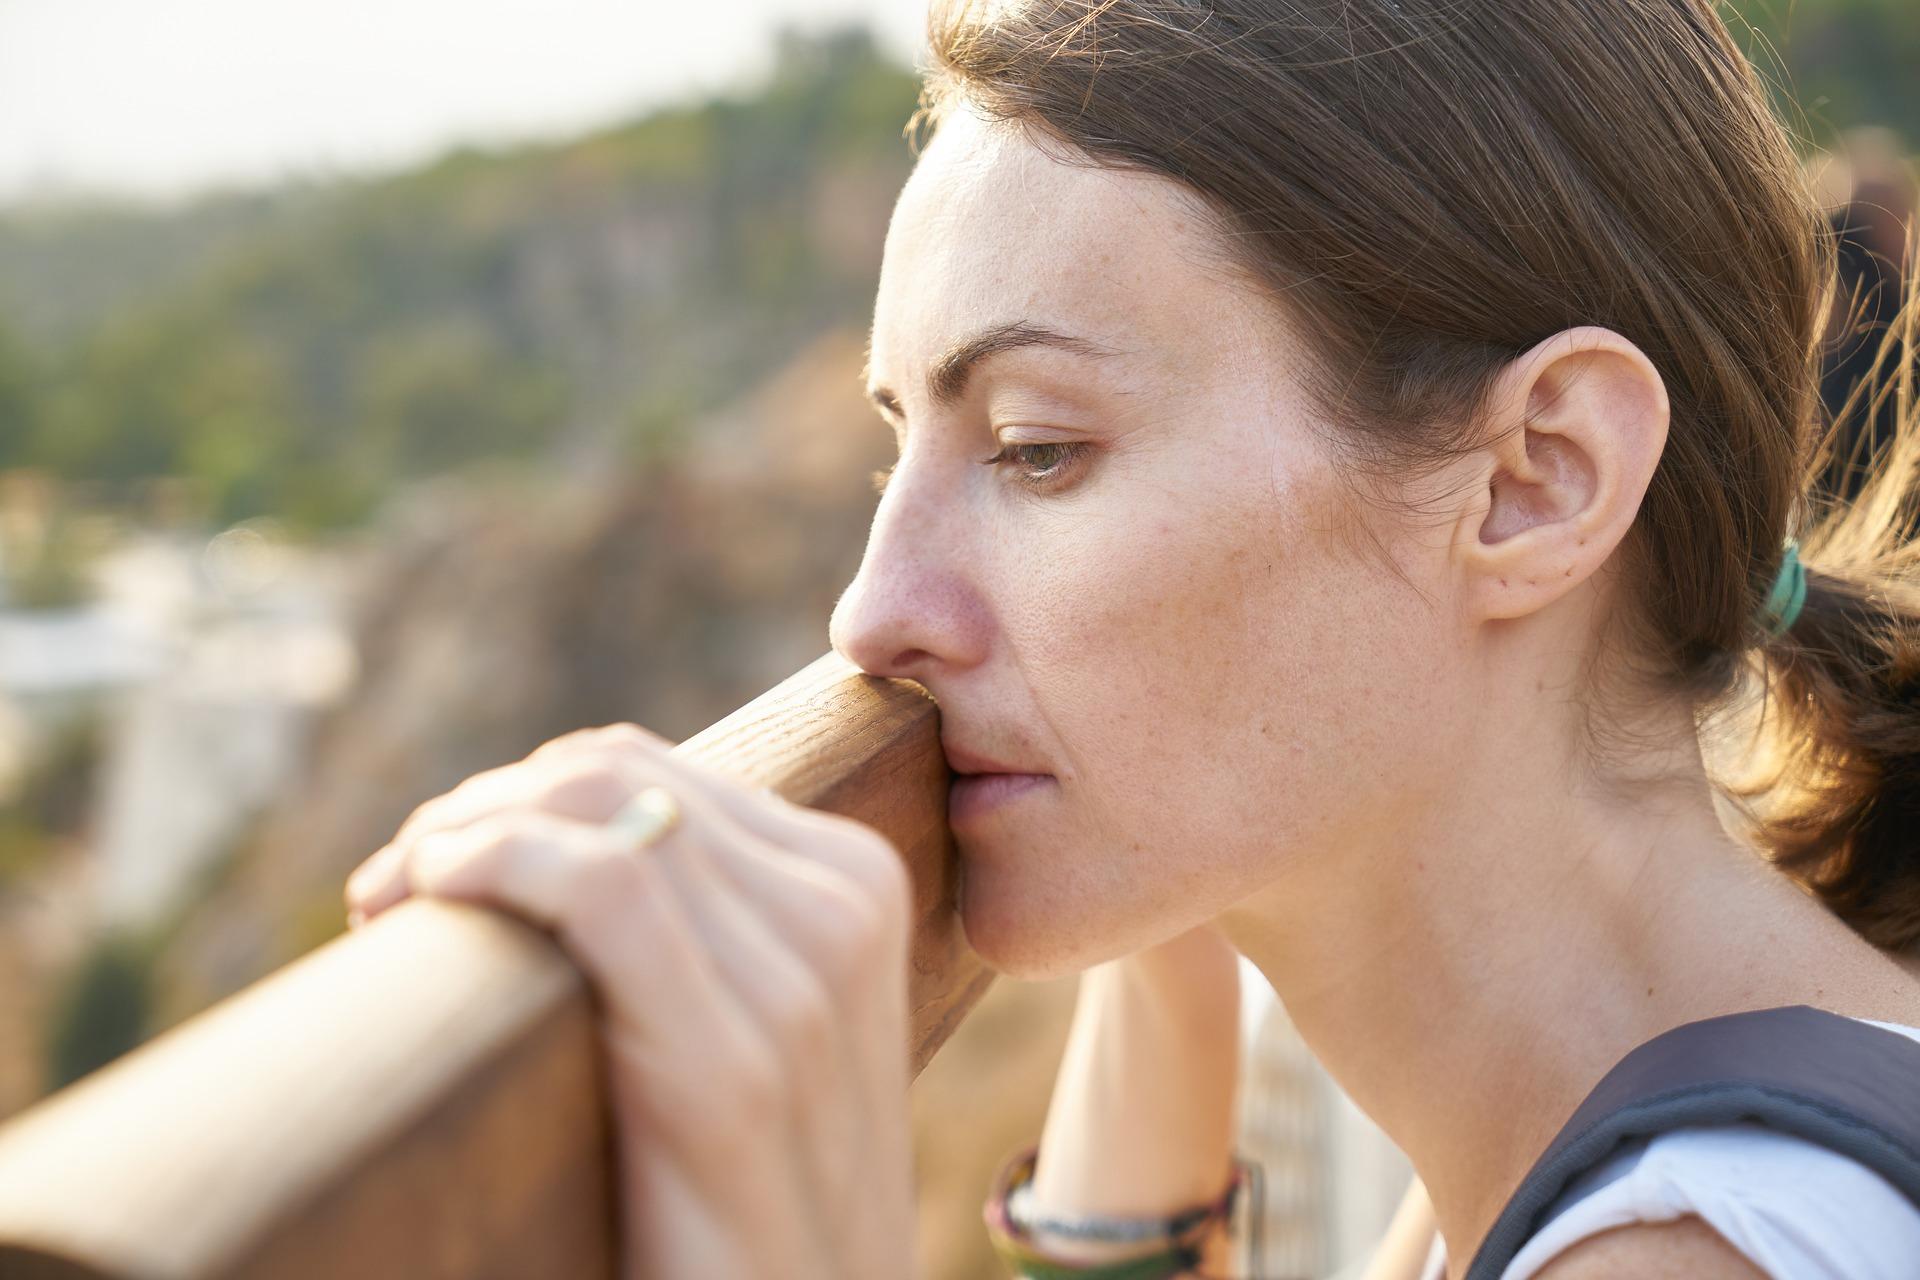 goitrogens-thyroid-blockers-or-harmless